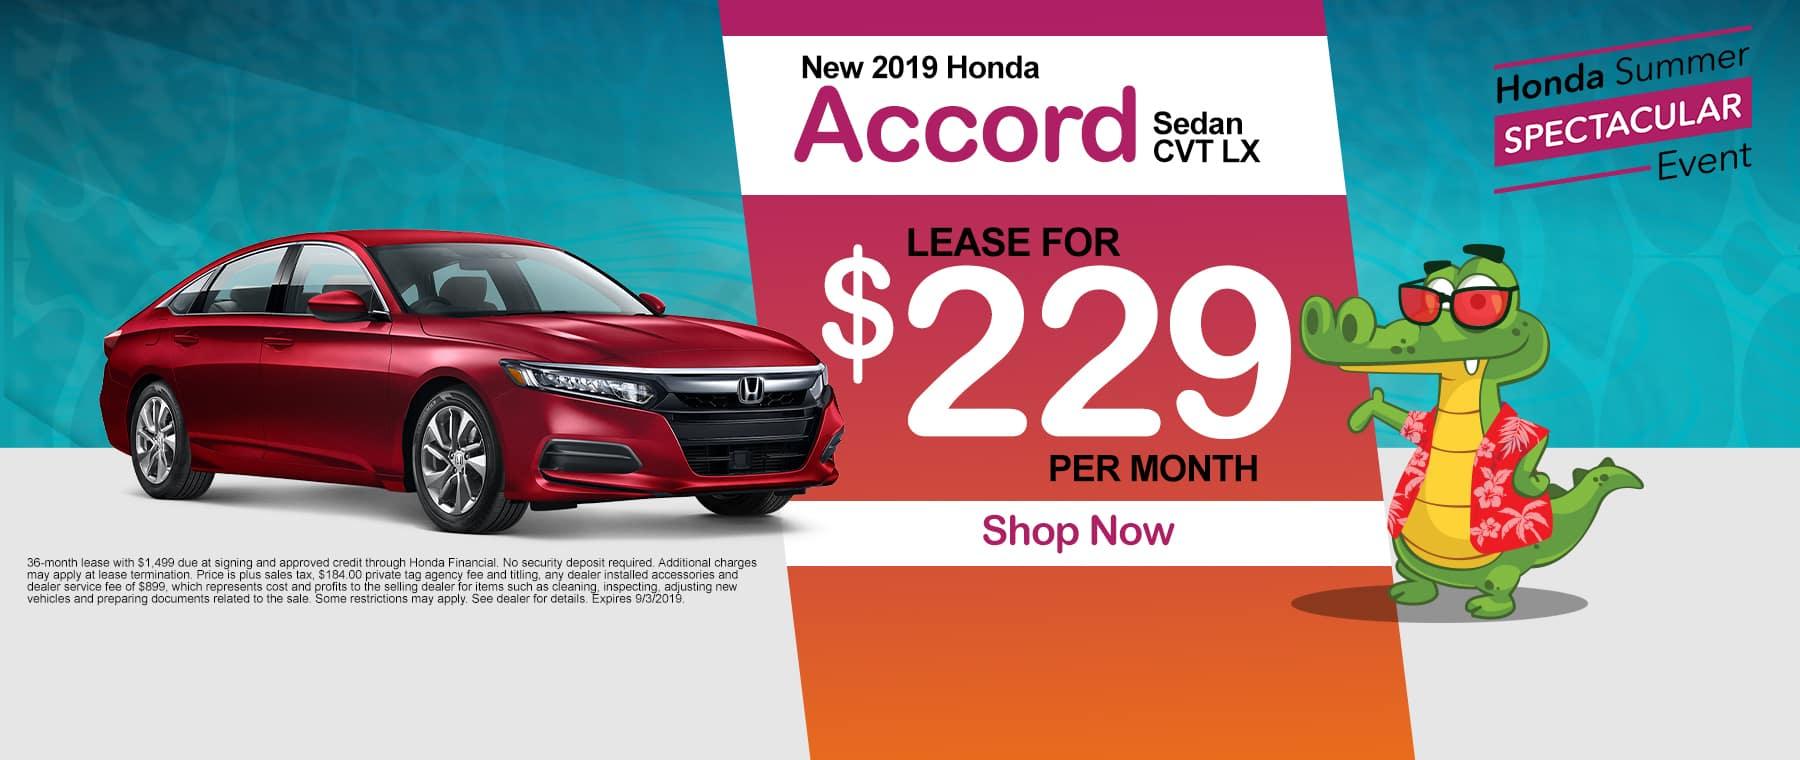 New 2019 Honda Civic Accord CVT LX | Lease For $229 Per Month